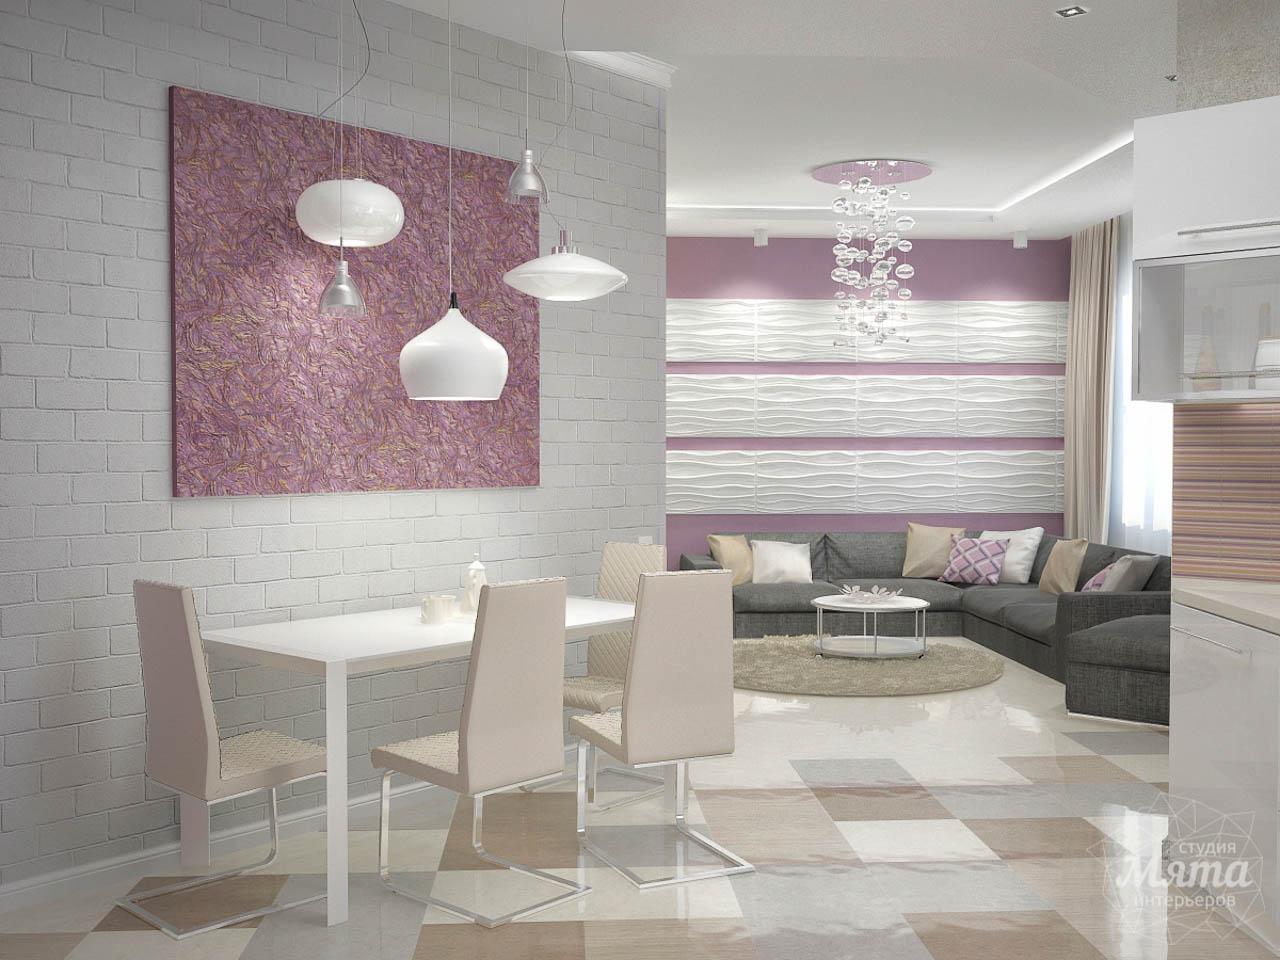 Дизайн интерьера и ремонт трехкомнатной квартиры по ул. Чкалова 124 img186201780